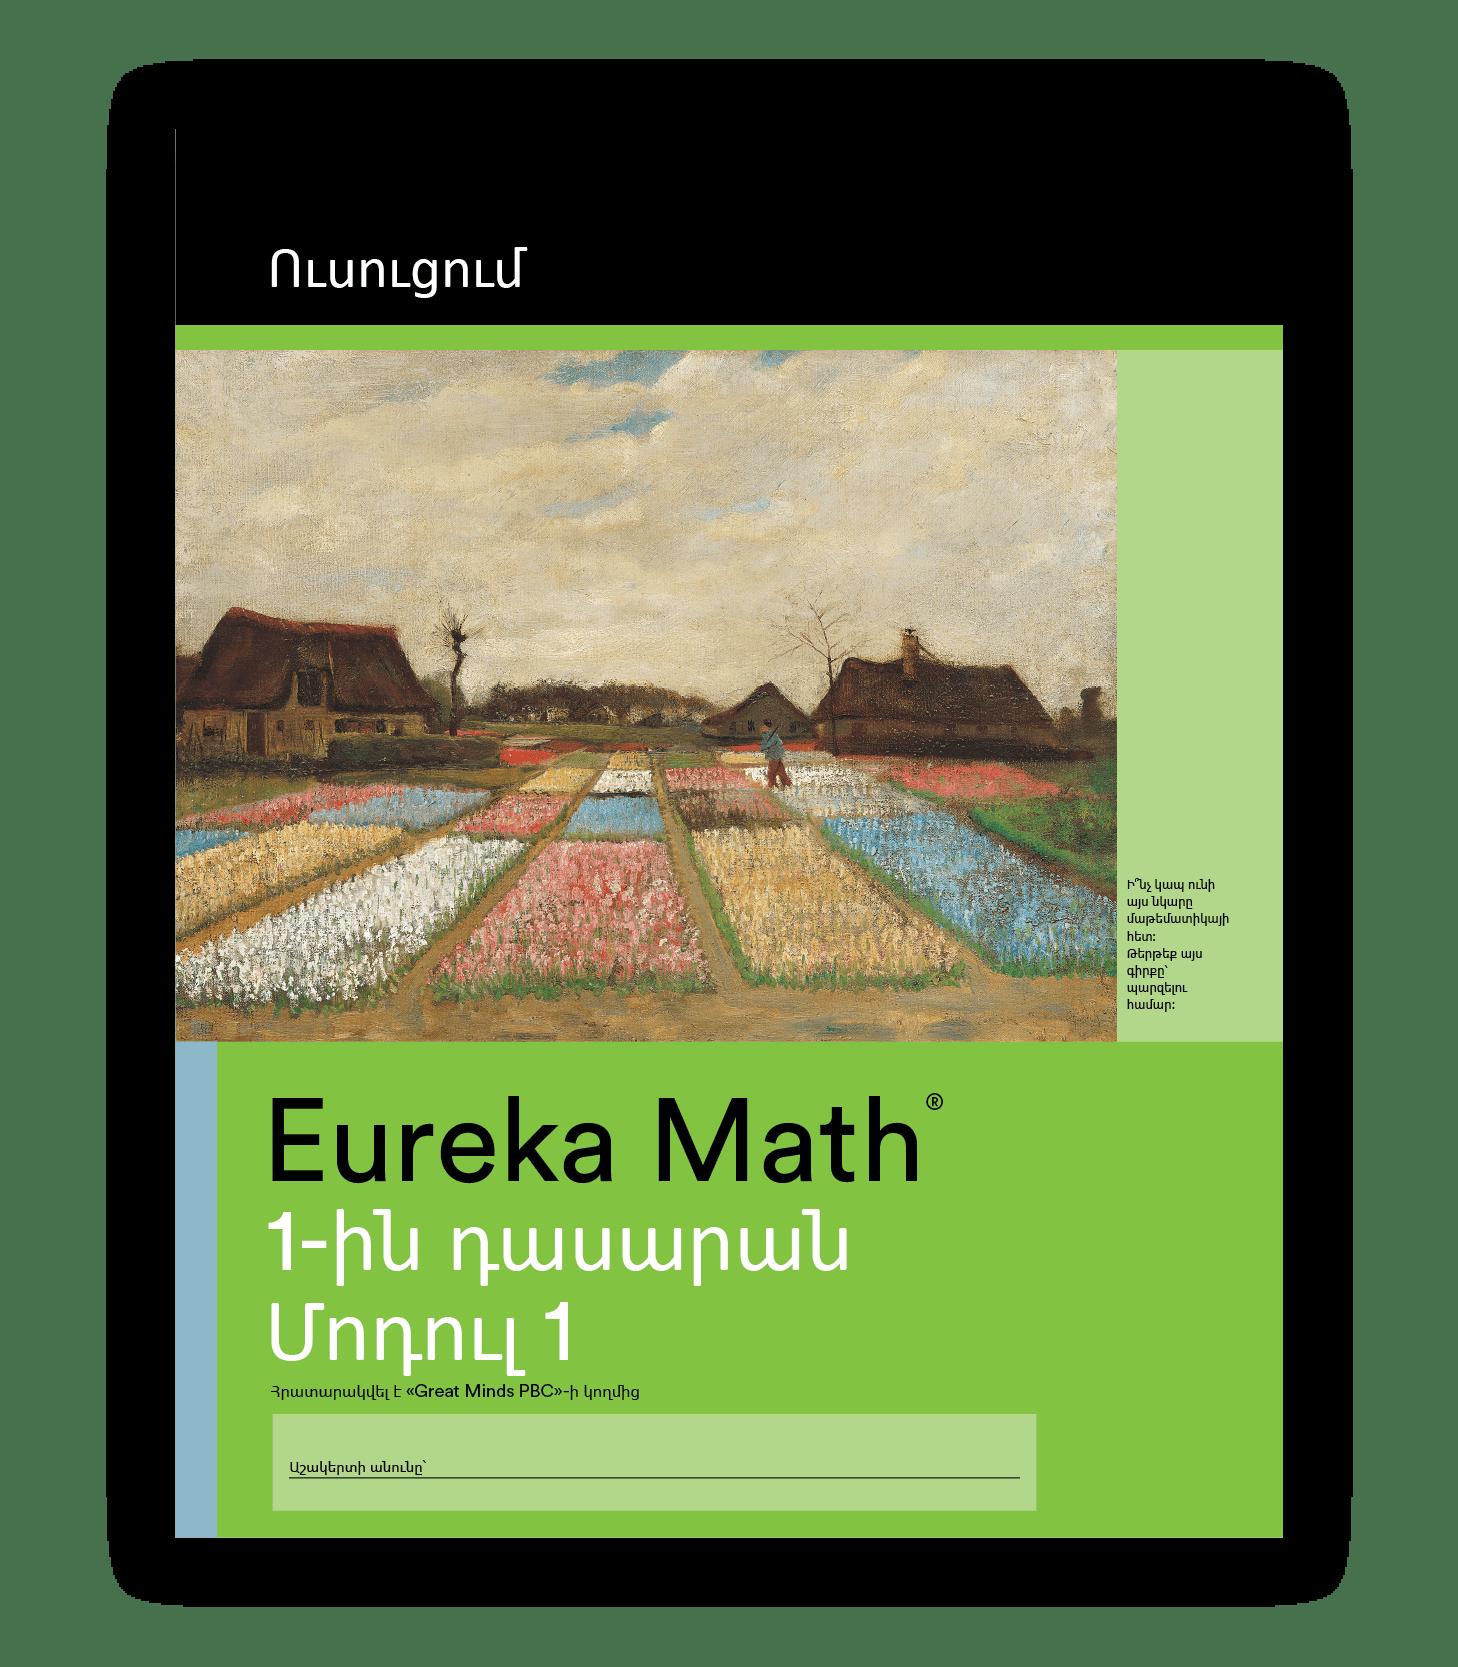 Eureka Math Learn Book in Armenian for Grade 1